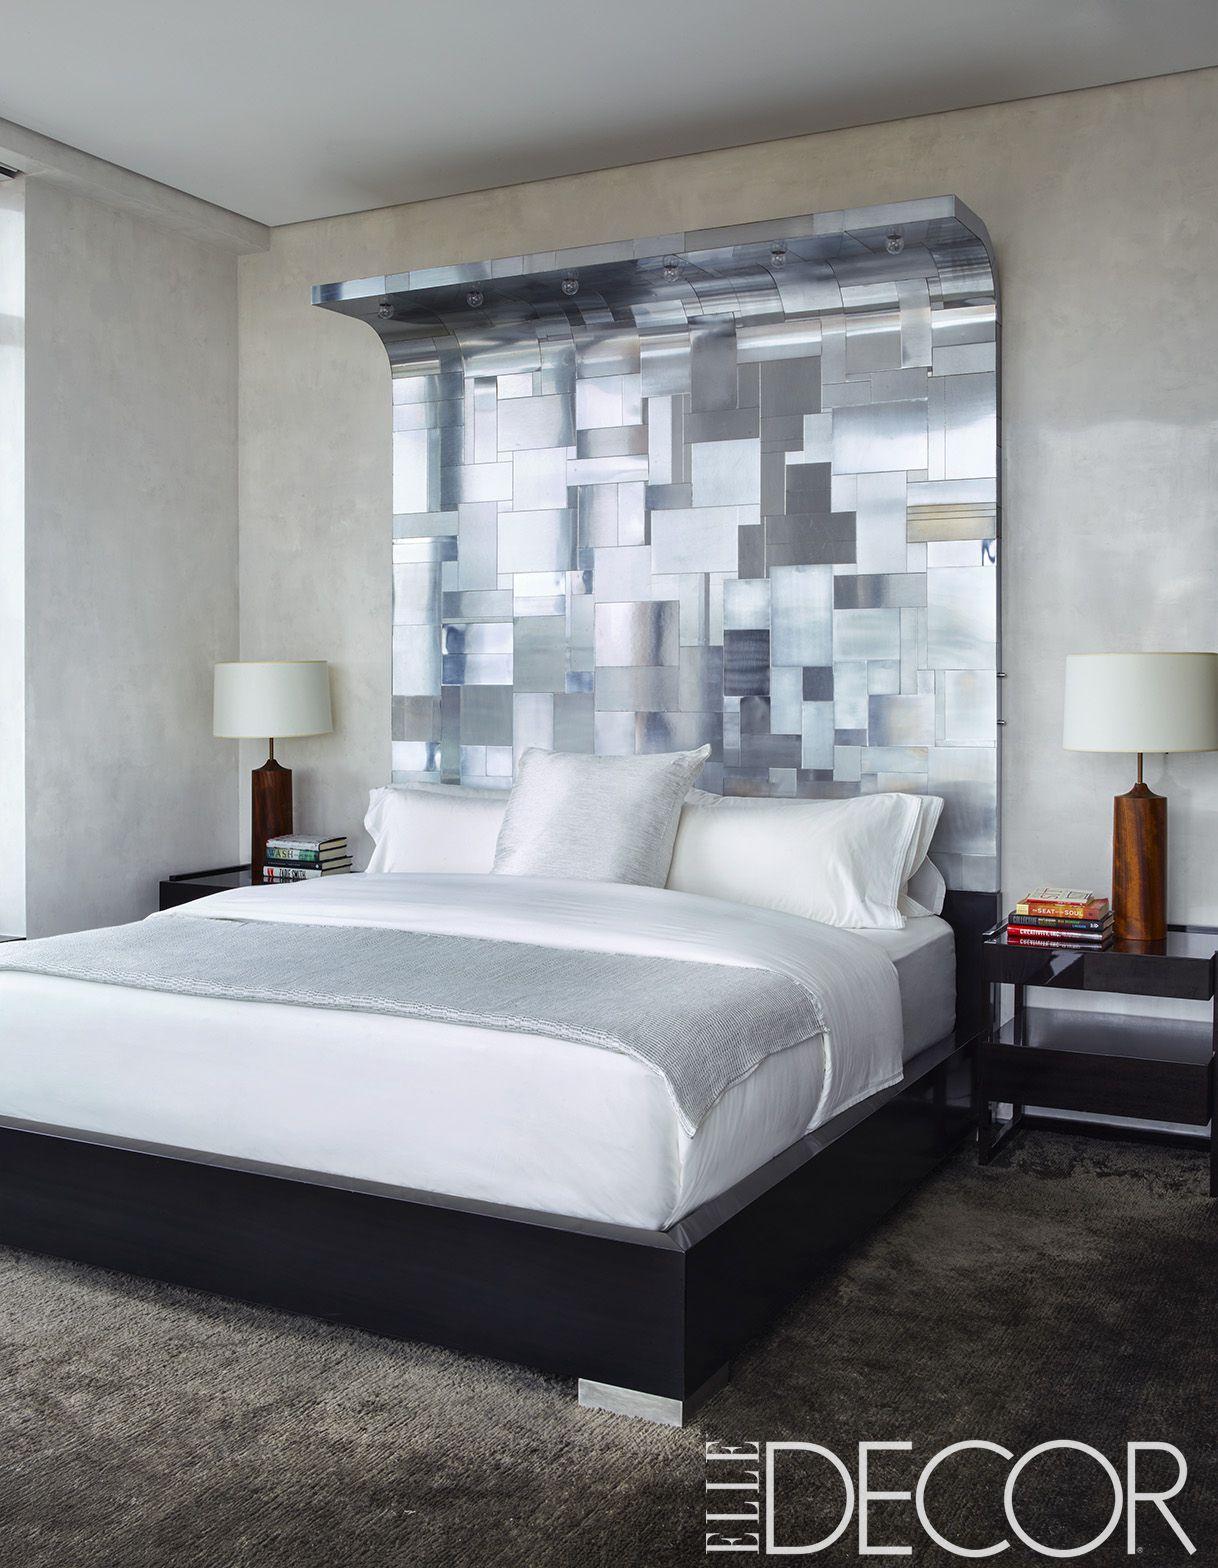 30+ Minimalist Bedroom Decor Ideas - Modern Designs for Minimalist Bedrooms